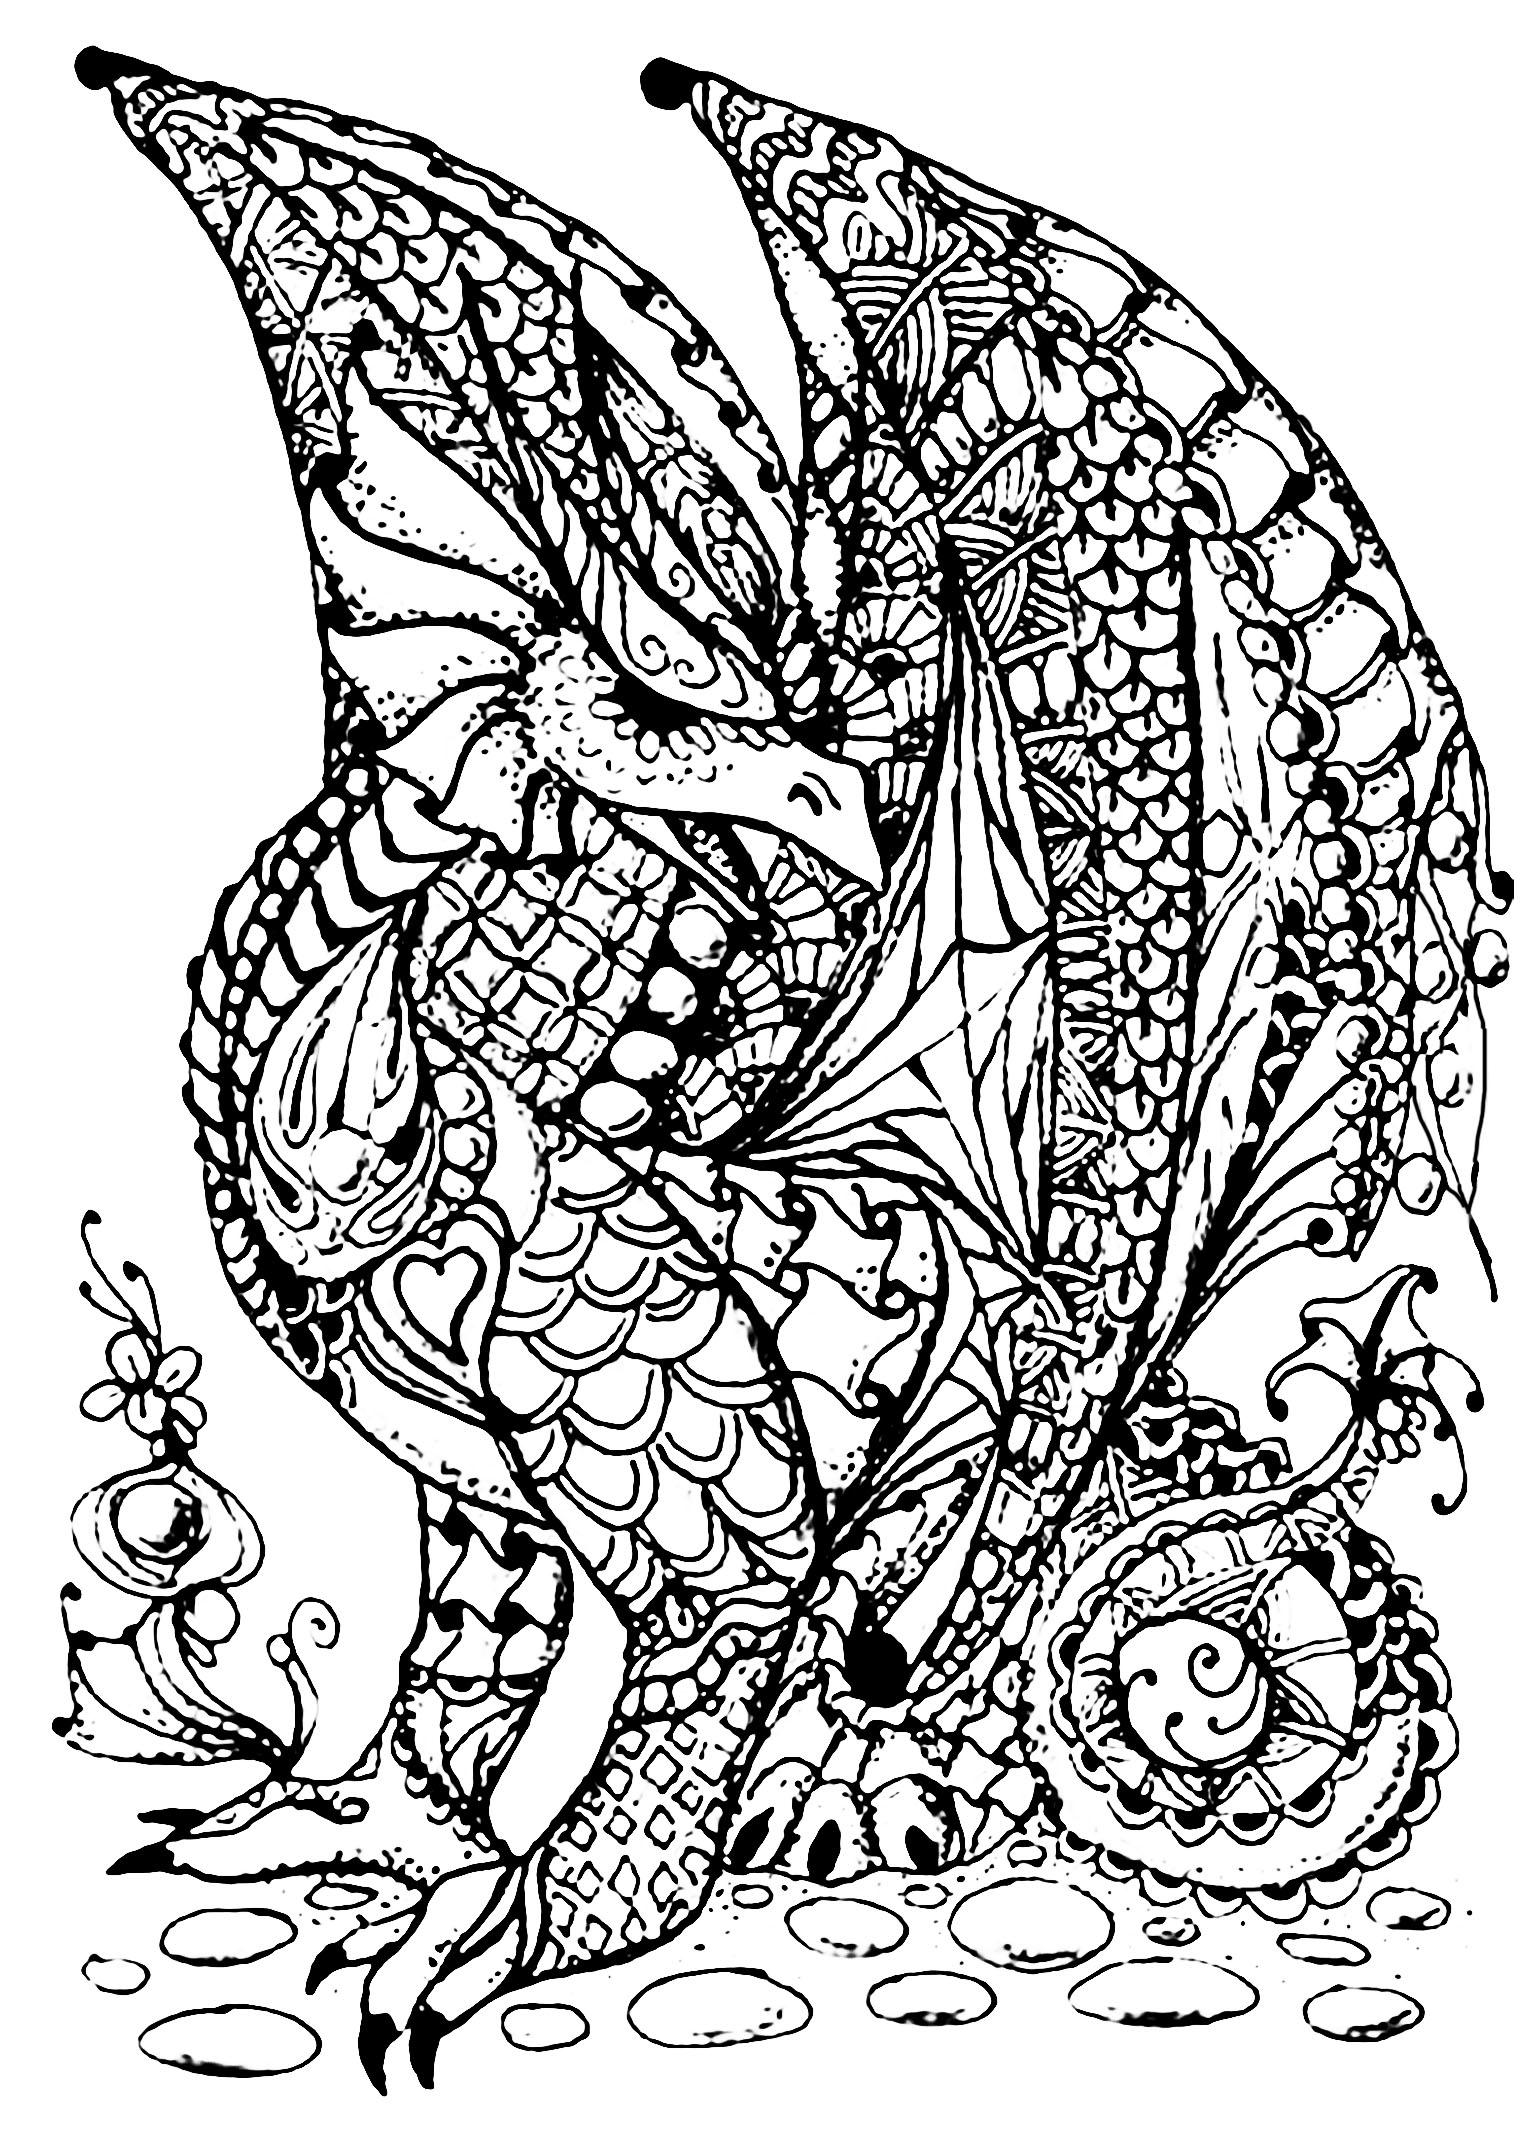 Draghi 90667 draghi disegni da colorare per adulti for Animali da colorare per adulti